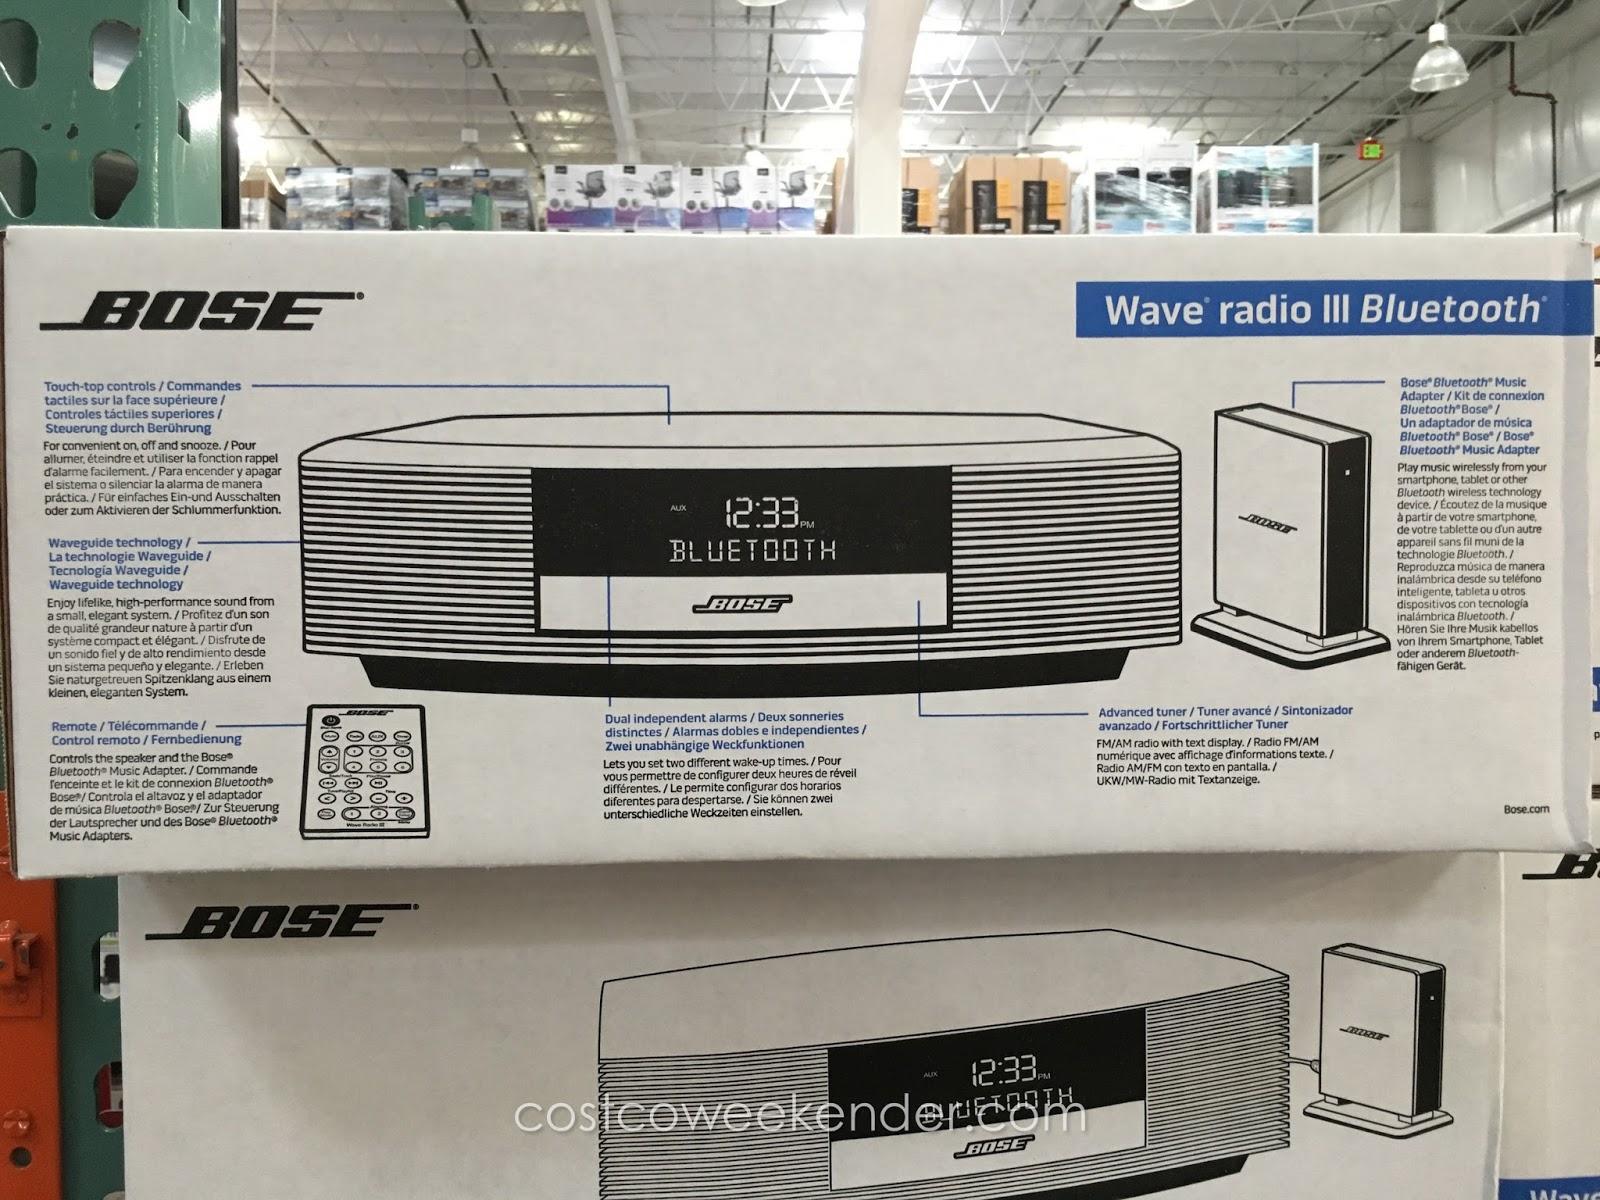 bose wave radio iii with bluetooth costco weekender. Black Bedroom Furniture Sets. Home Design Ideas